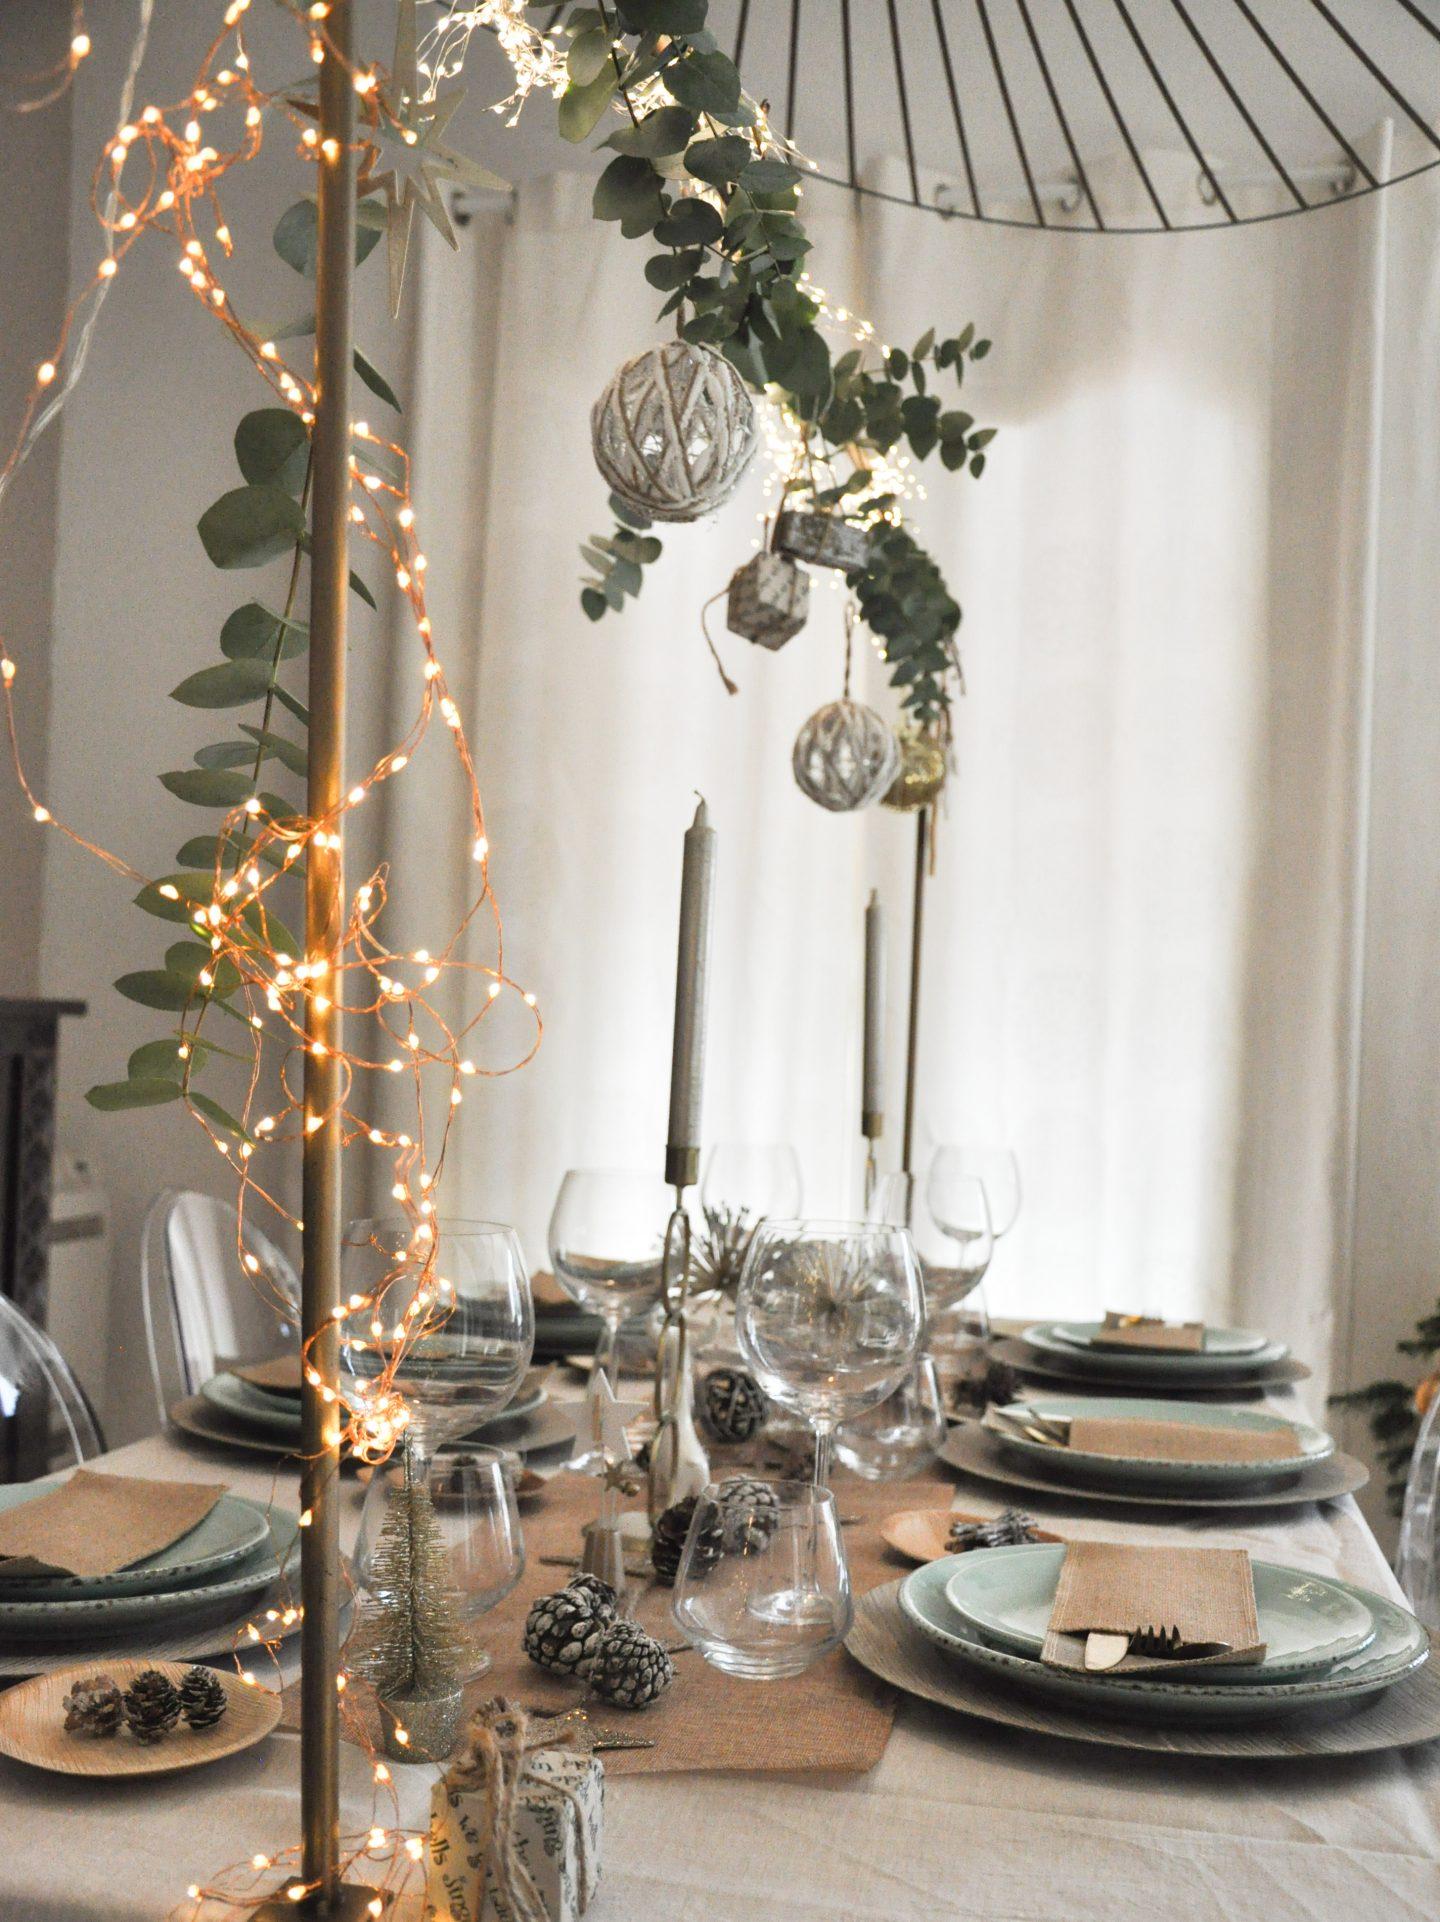 Vue table de Noël